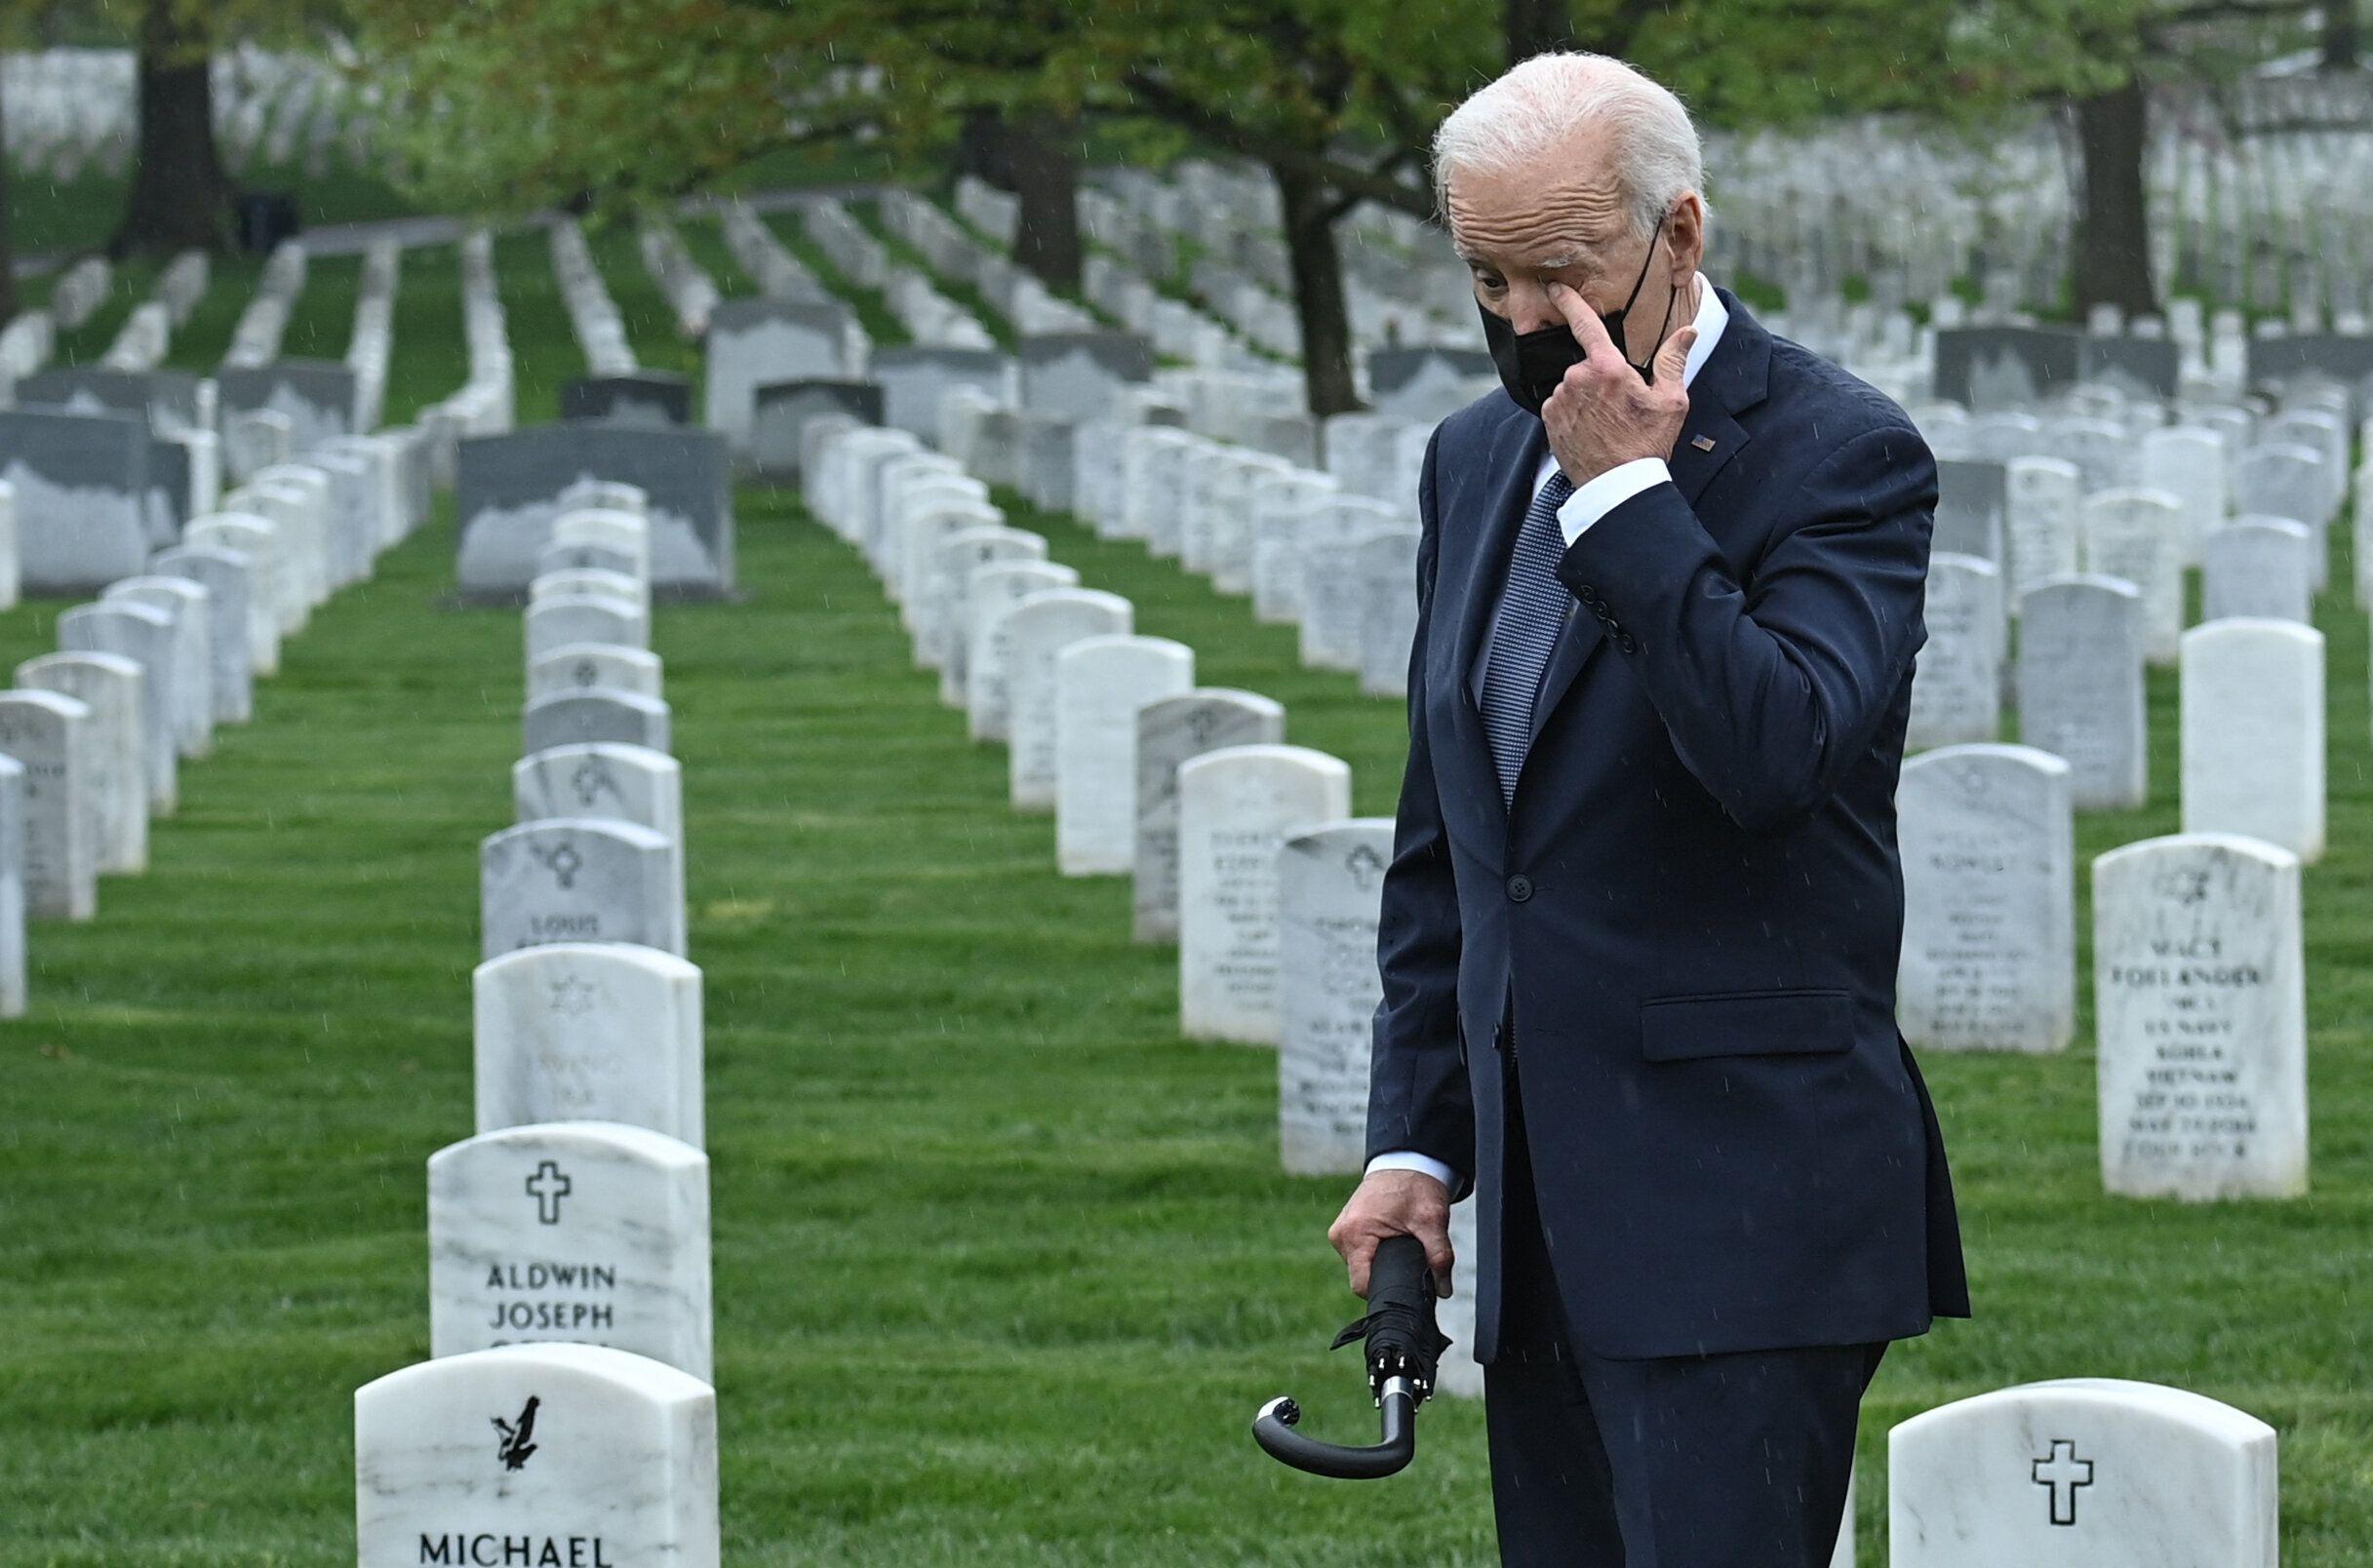 President Joe Biden wipes his eye as he walks through Arlington National Cemetery in Virginia on Wednesday.